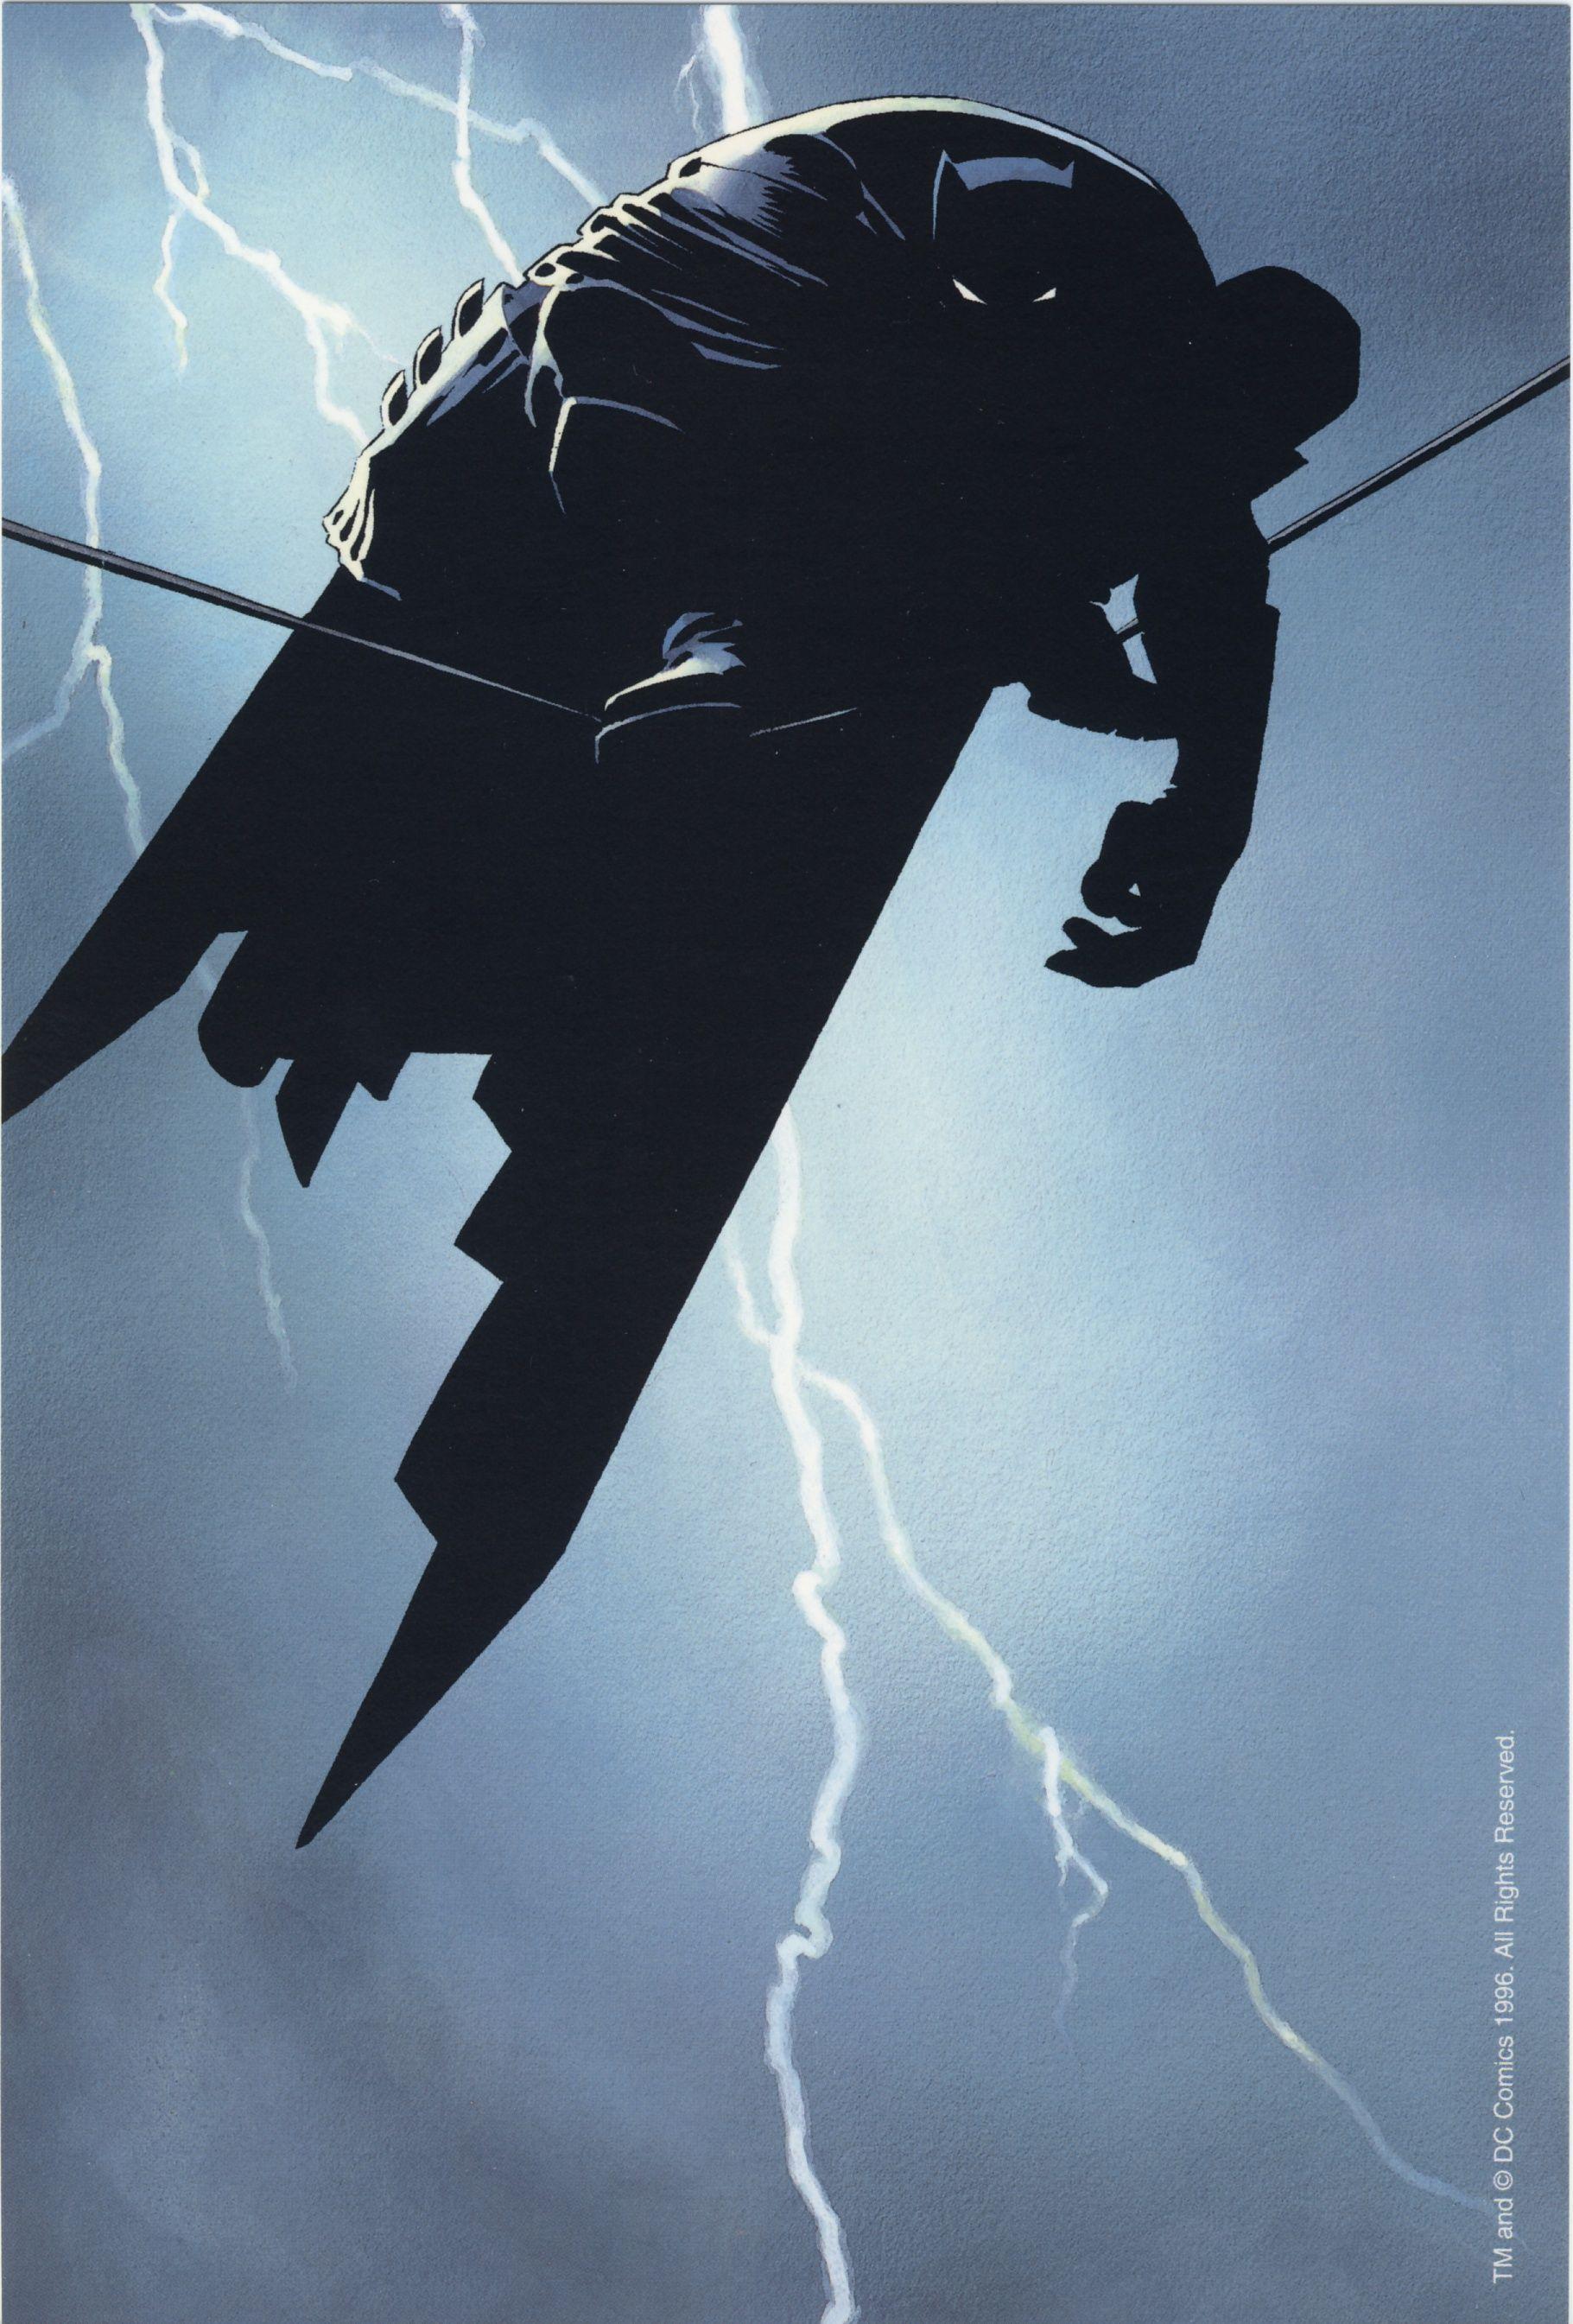 Batman The Dark Knight Returns Tenth Anniversary Edition With